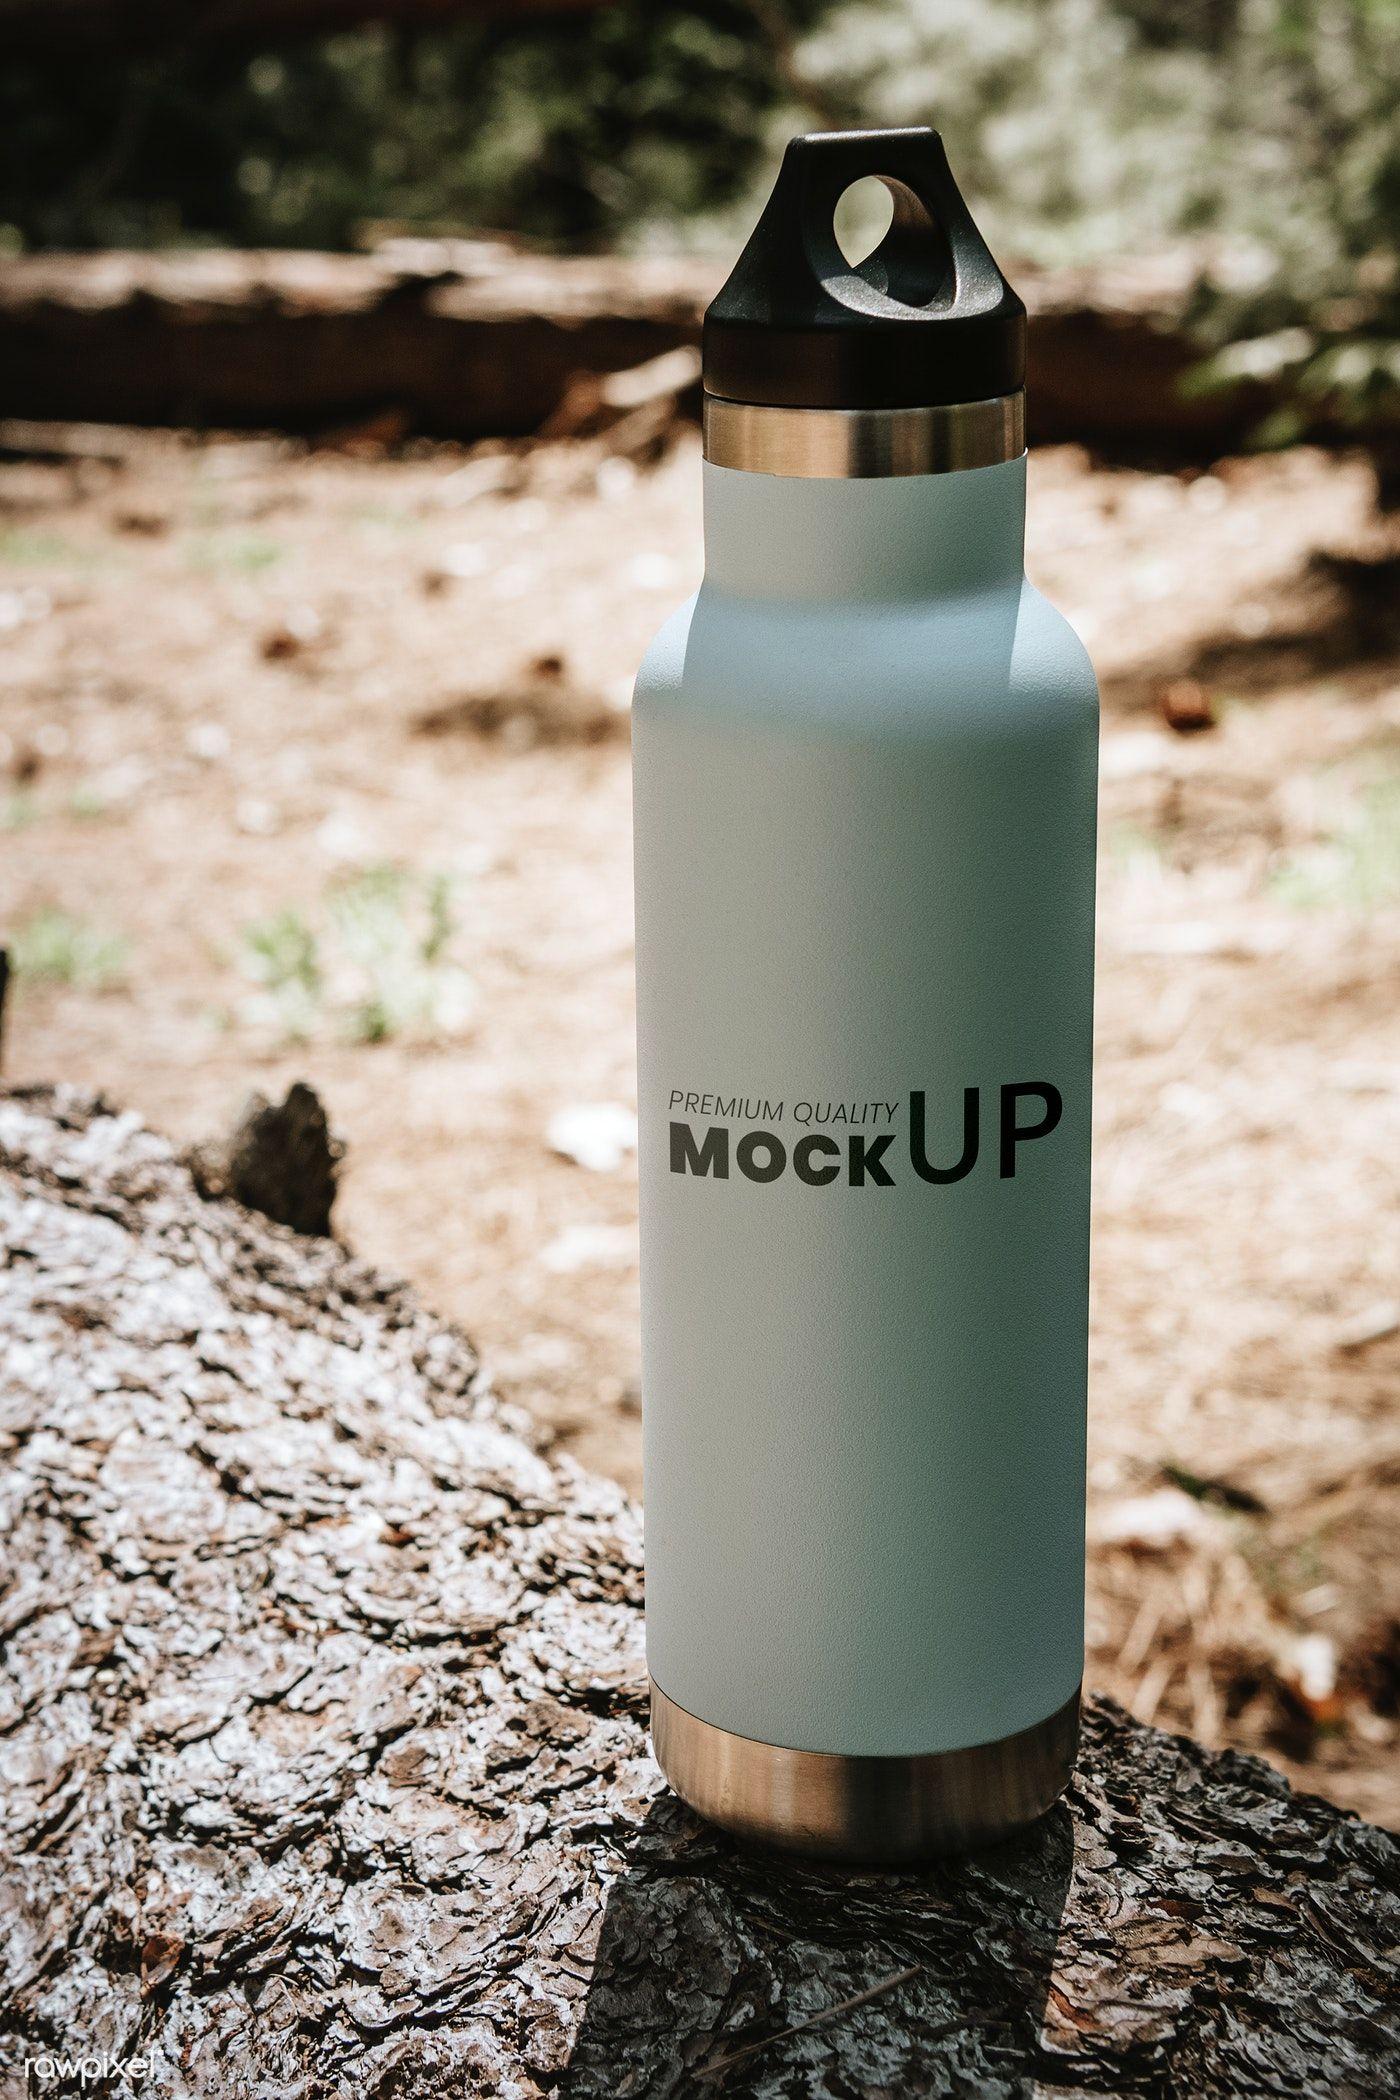 Download Download Premium Psd Of Water Bottle Mockup In The Forest 1221380 Bottle Mockup Water Bottle Bottle